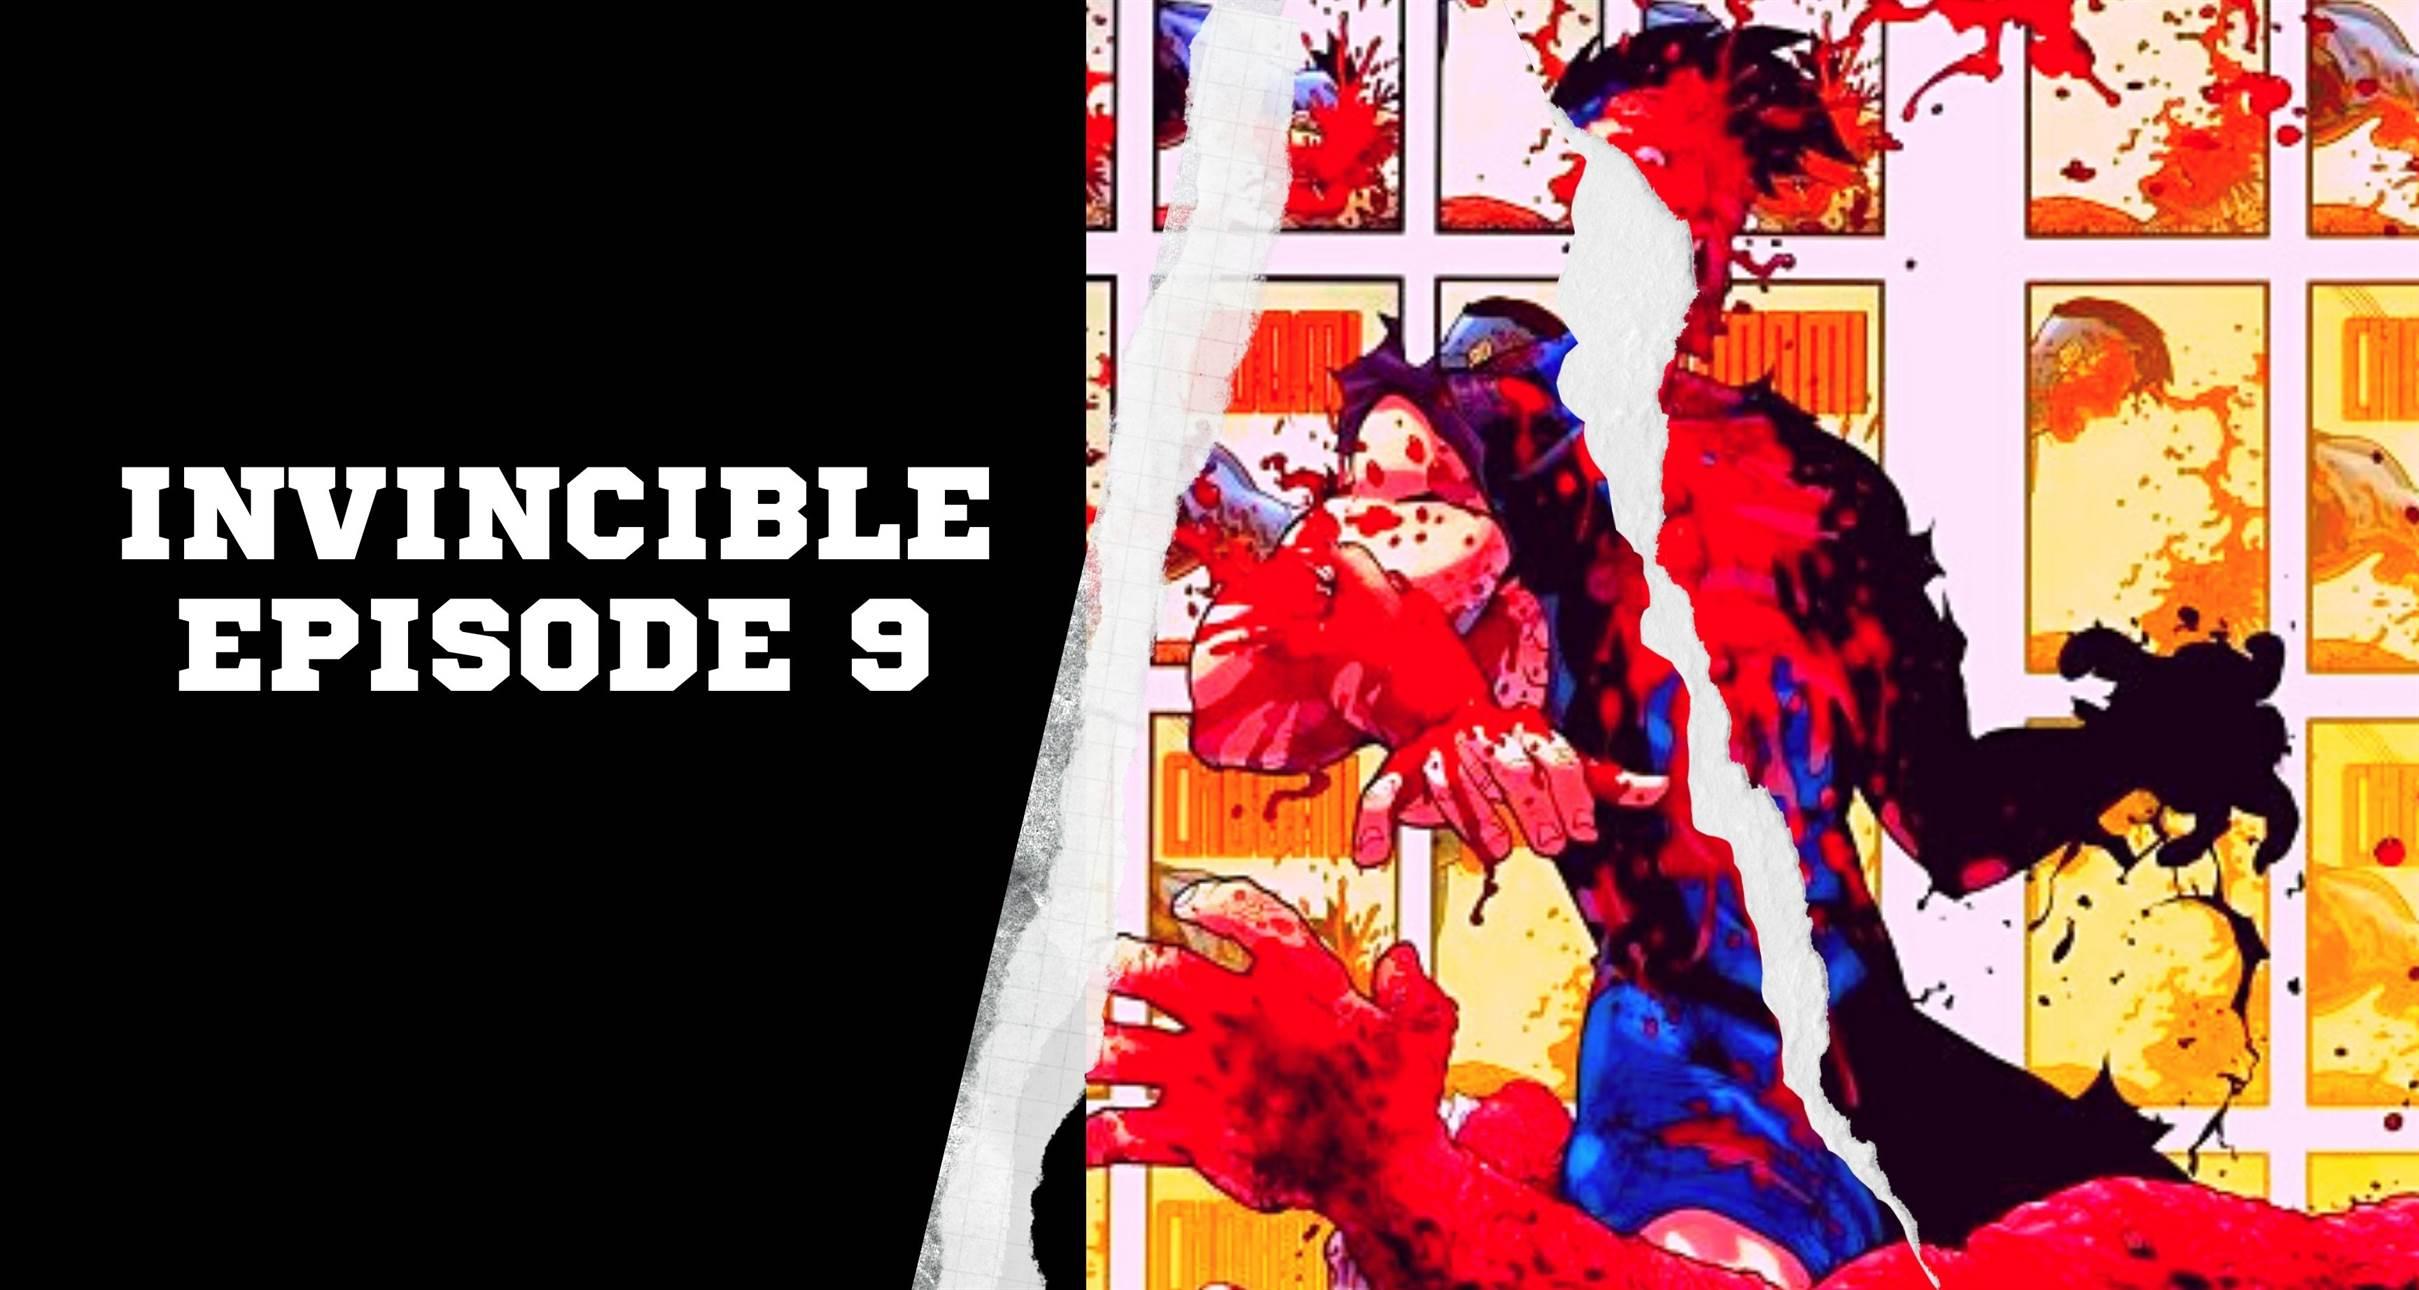 Invincible Episode 9